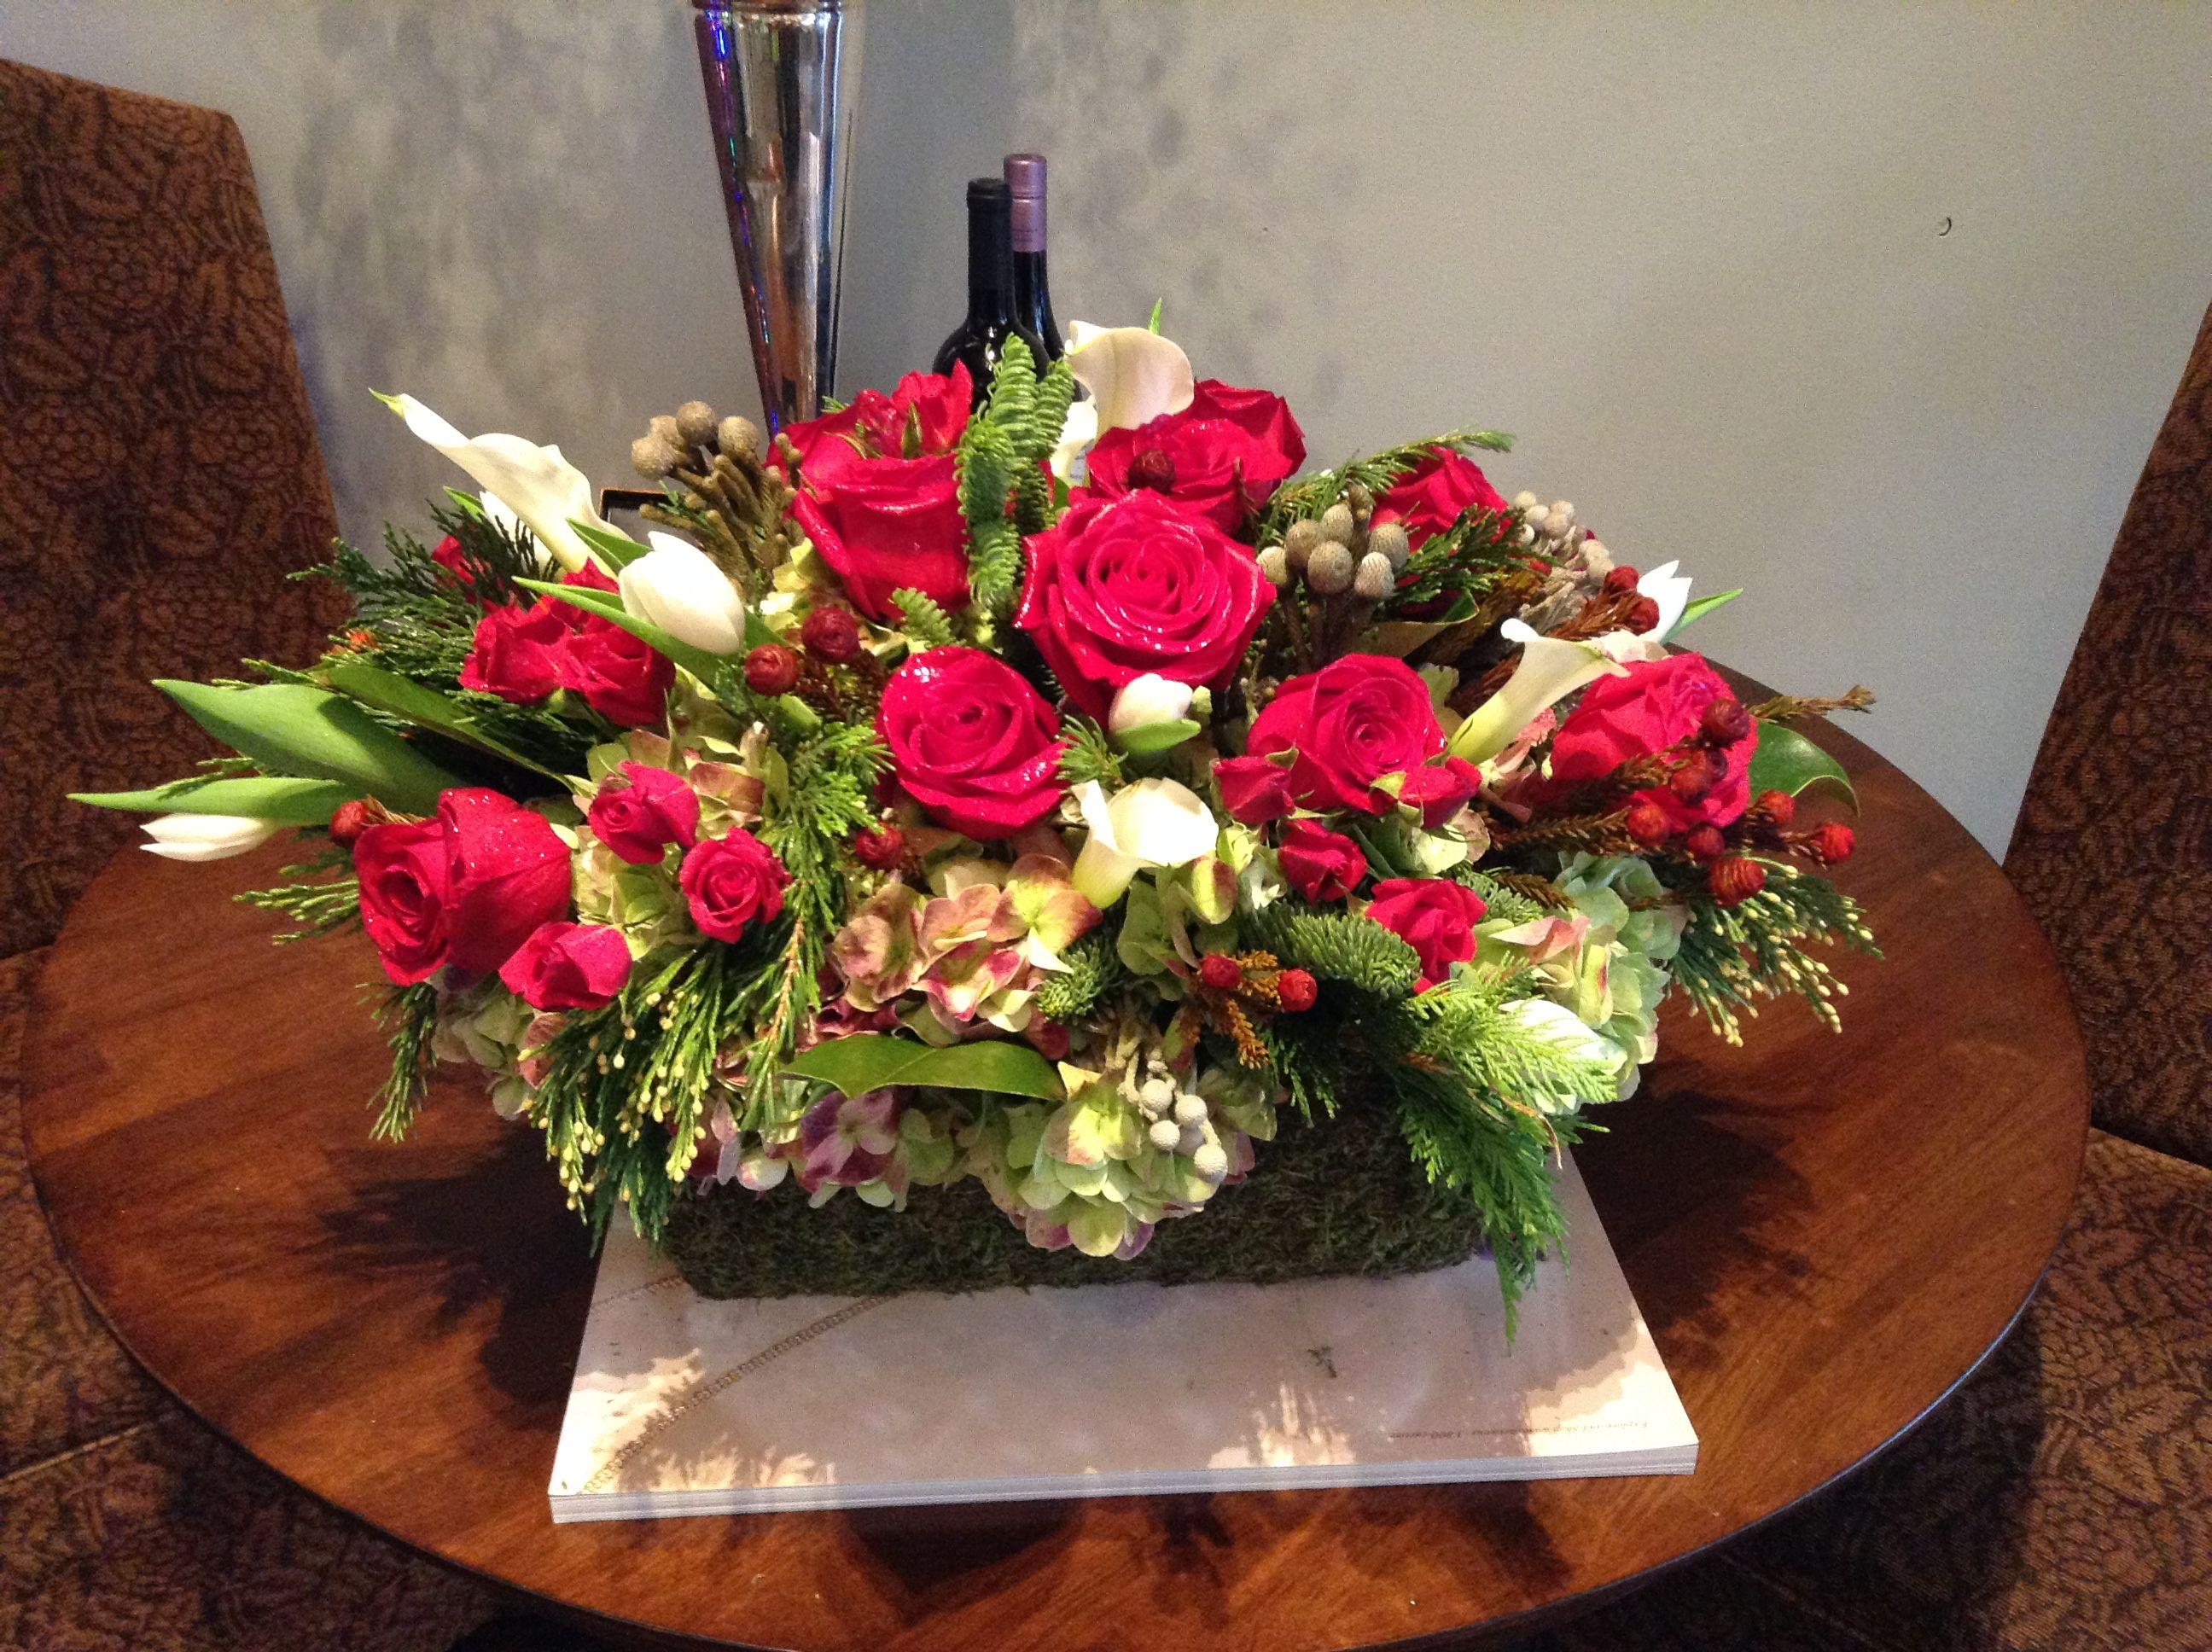 Tis the season! Beautiful arrangement for Christmas   www.amaranthusonmain.com